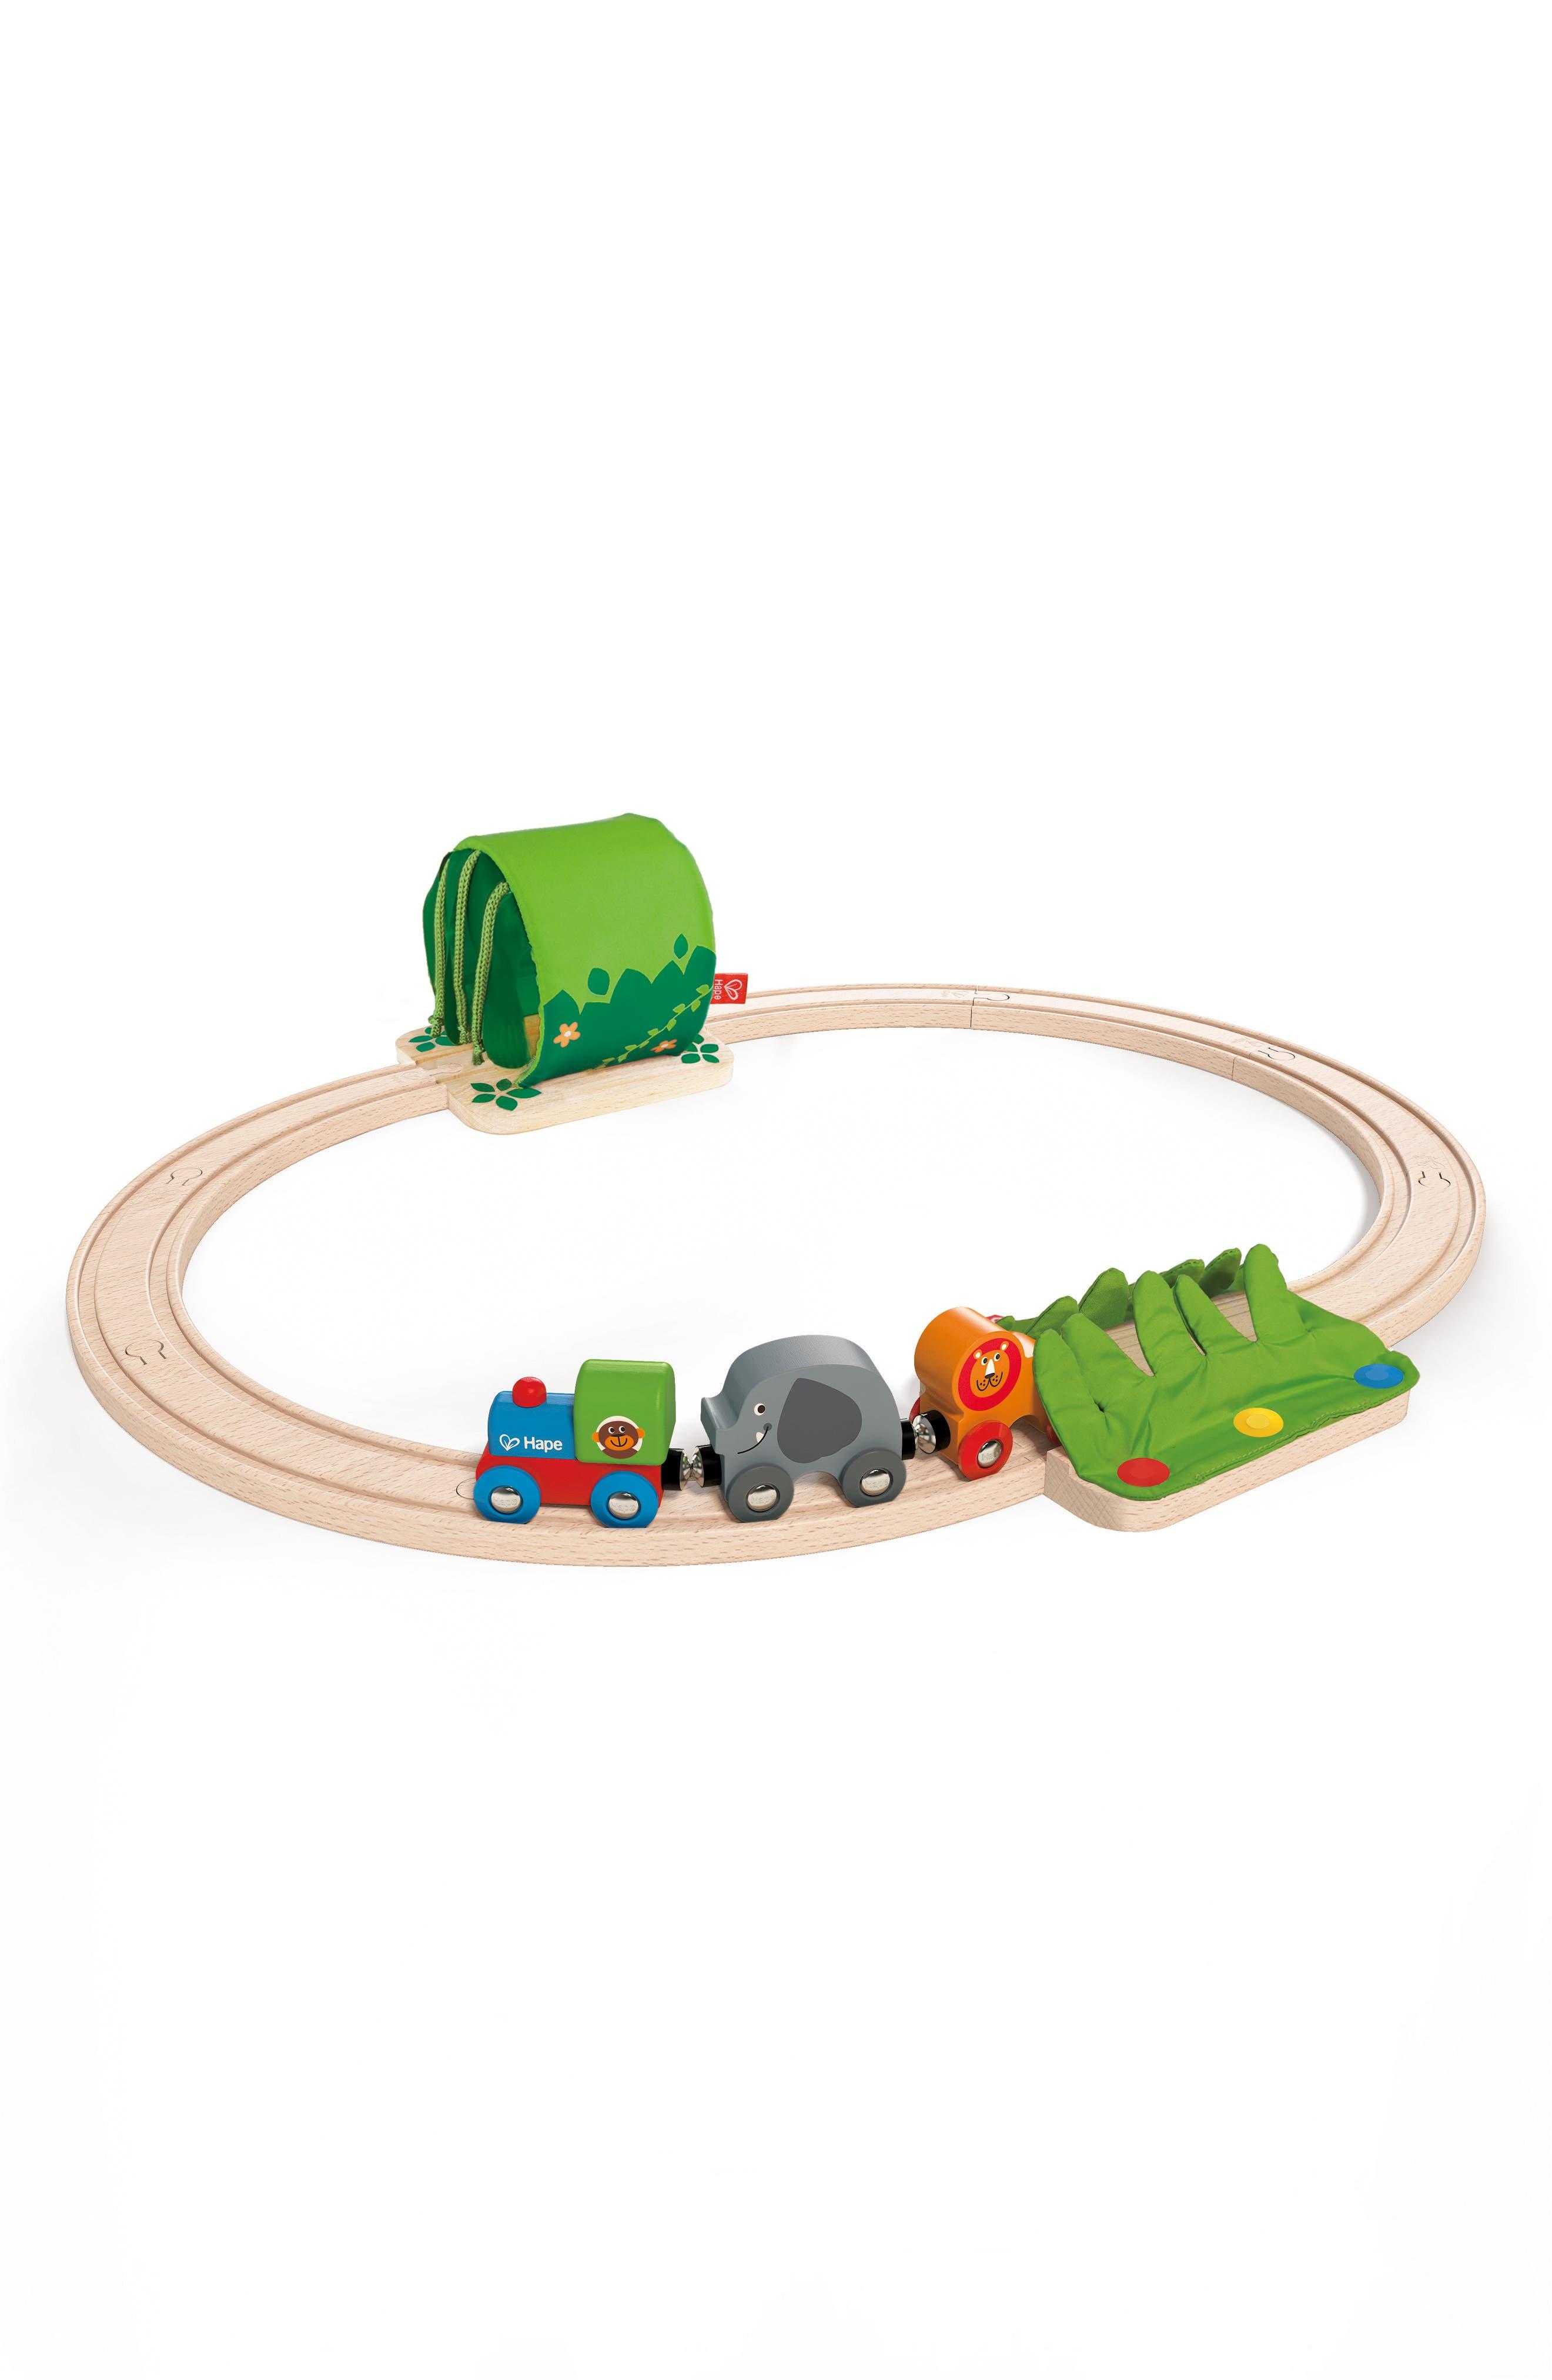 Jungle Train Journey Wooden Train Set,                         Main,                         color,